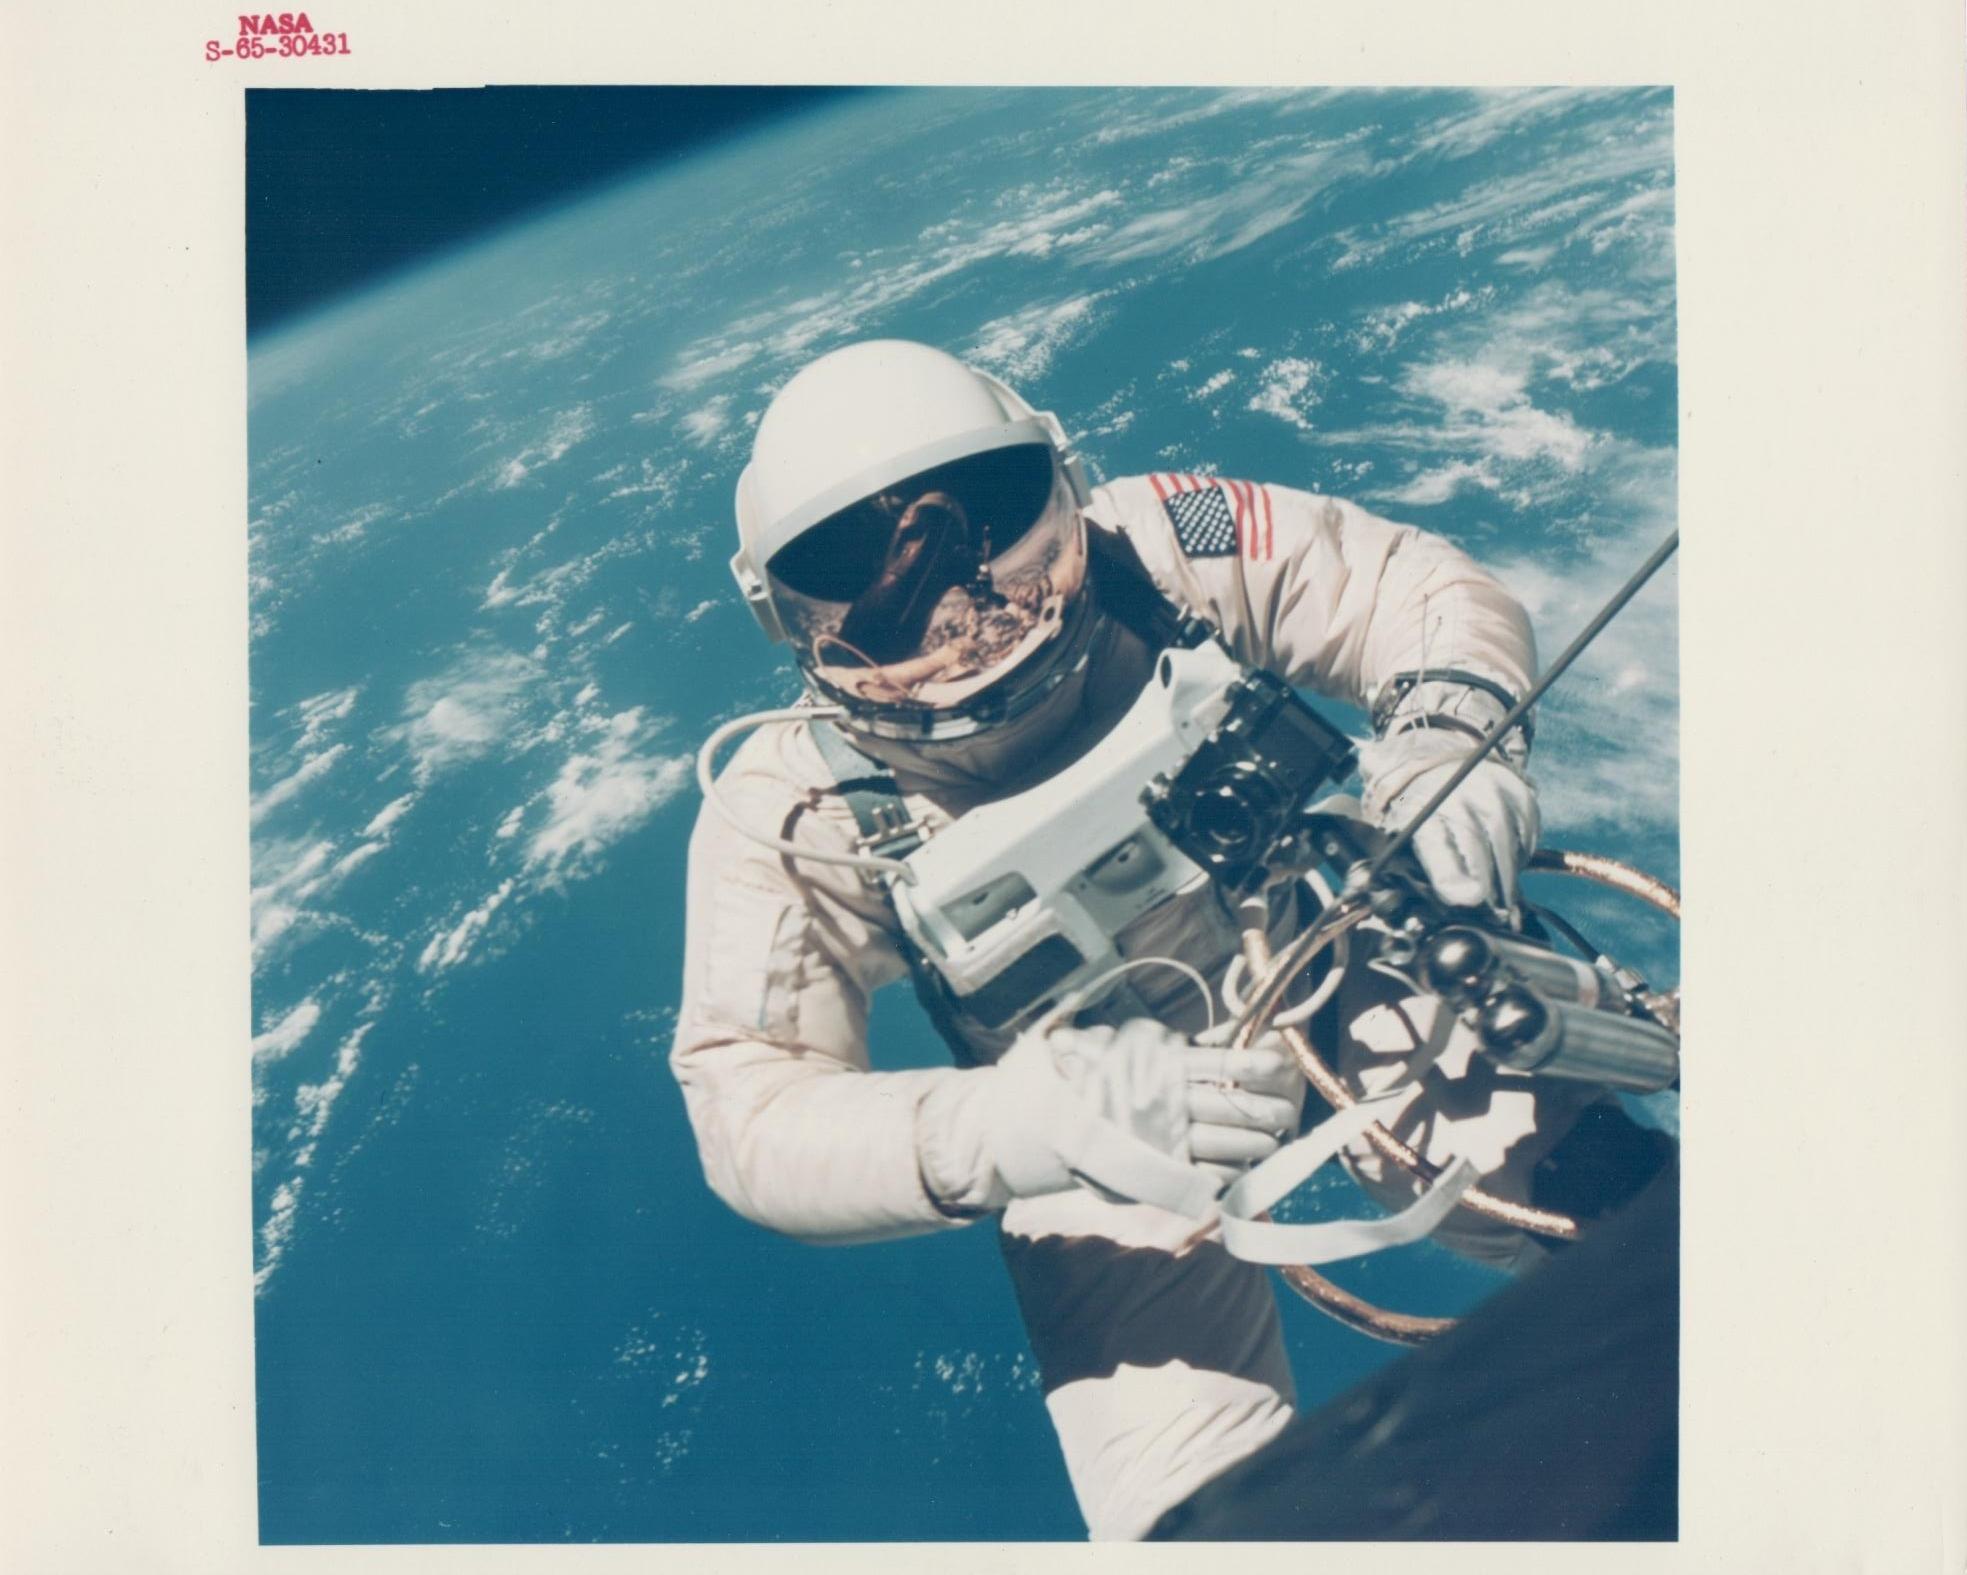 vintage astronaut photography - photo #4